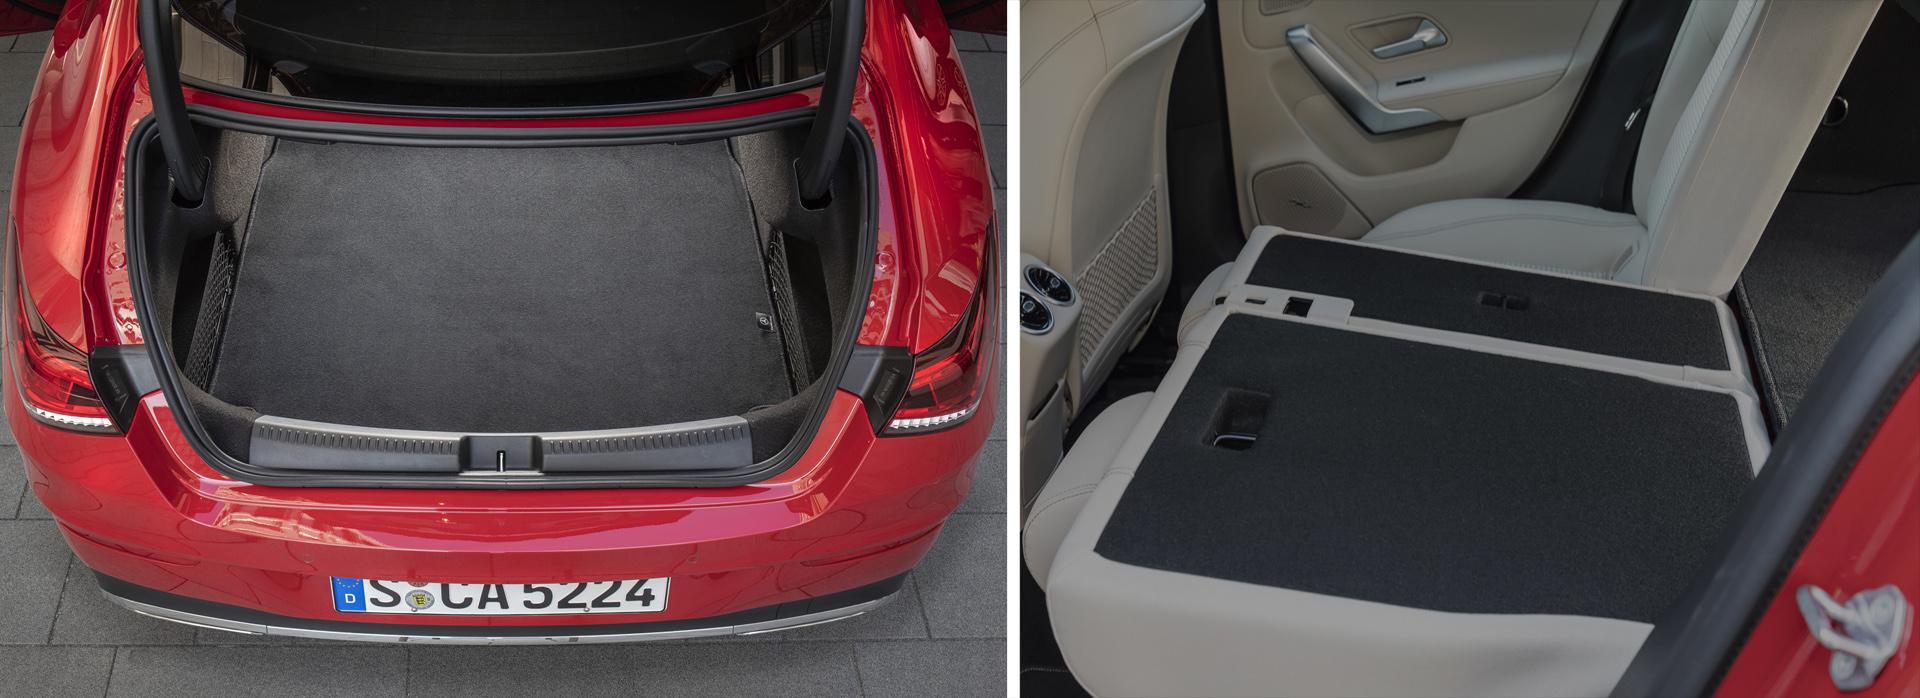 Новый Mercedes-Benz CLA: дверьё моё